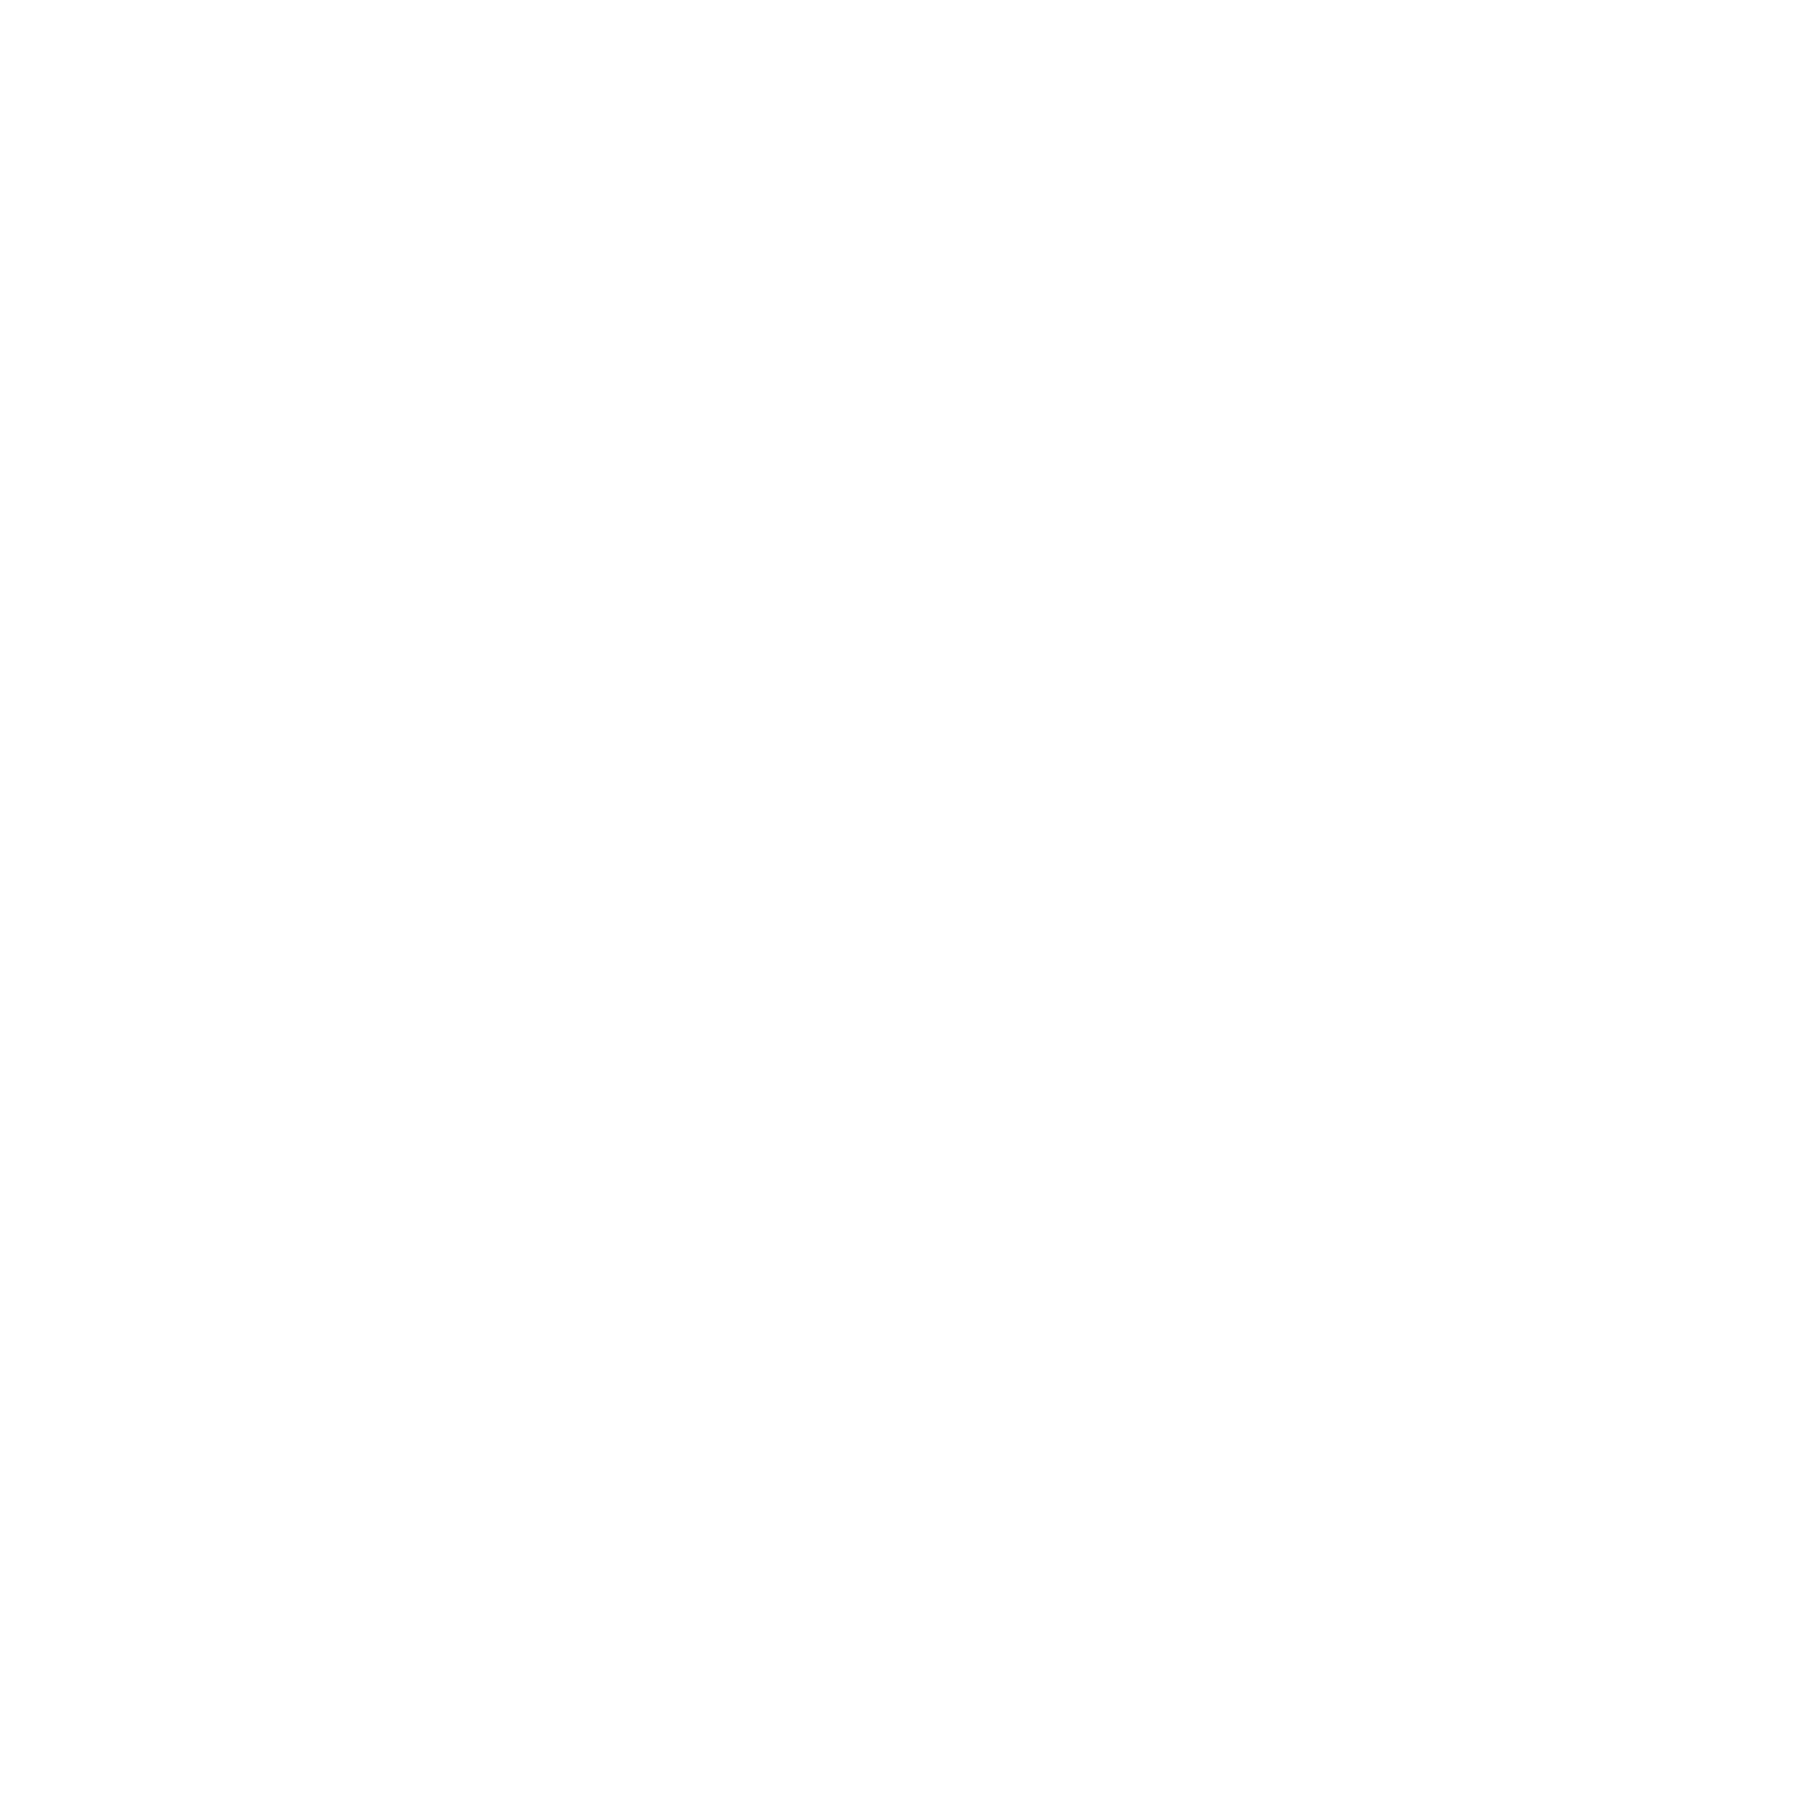 LIVE A SHOW